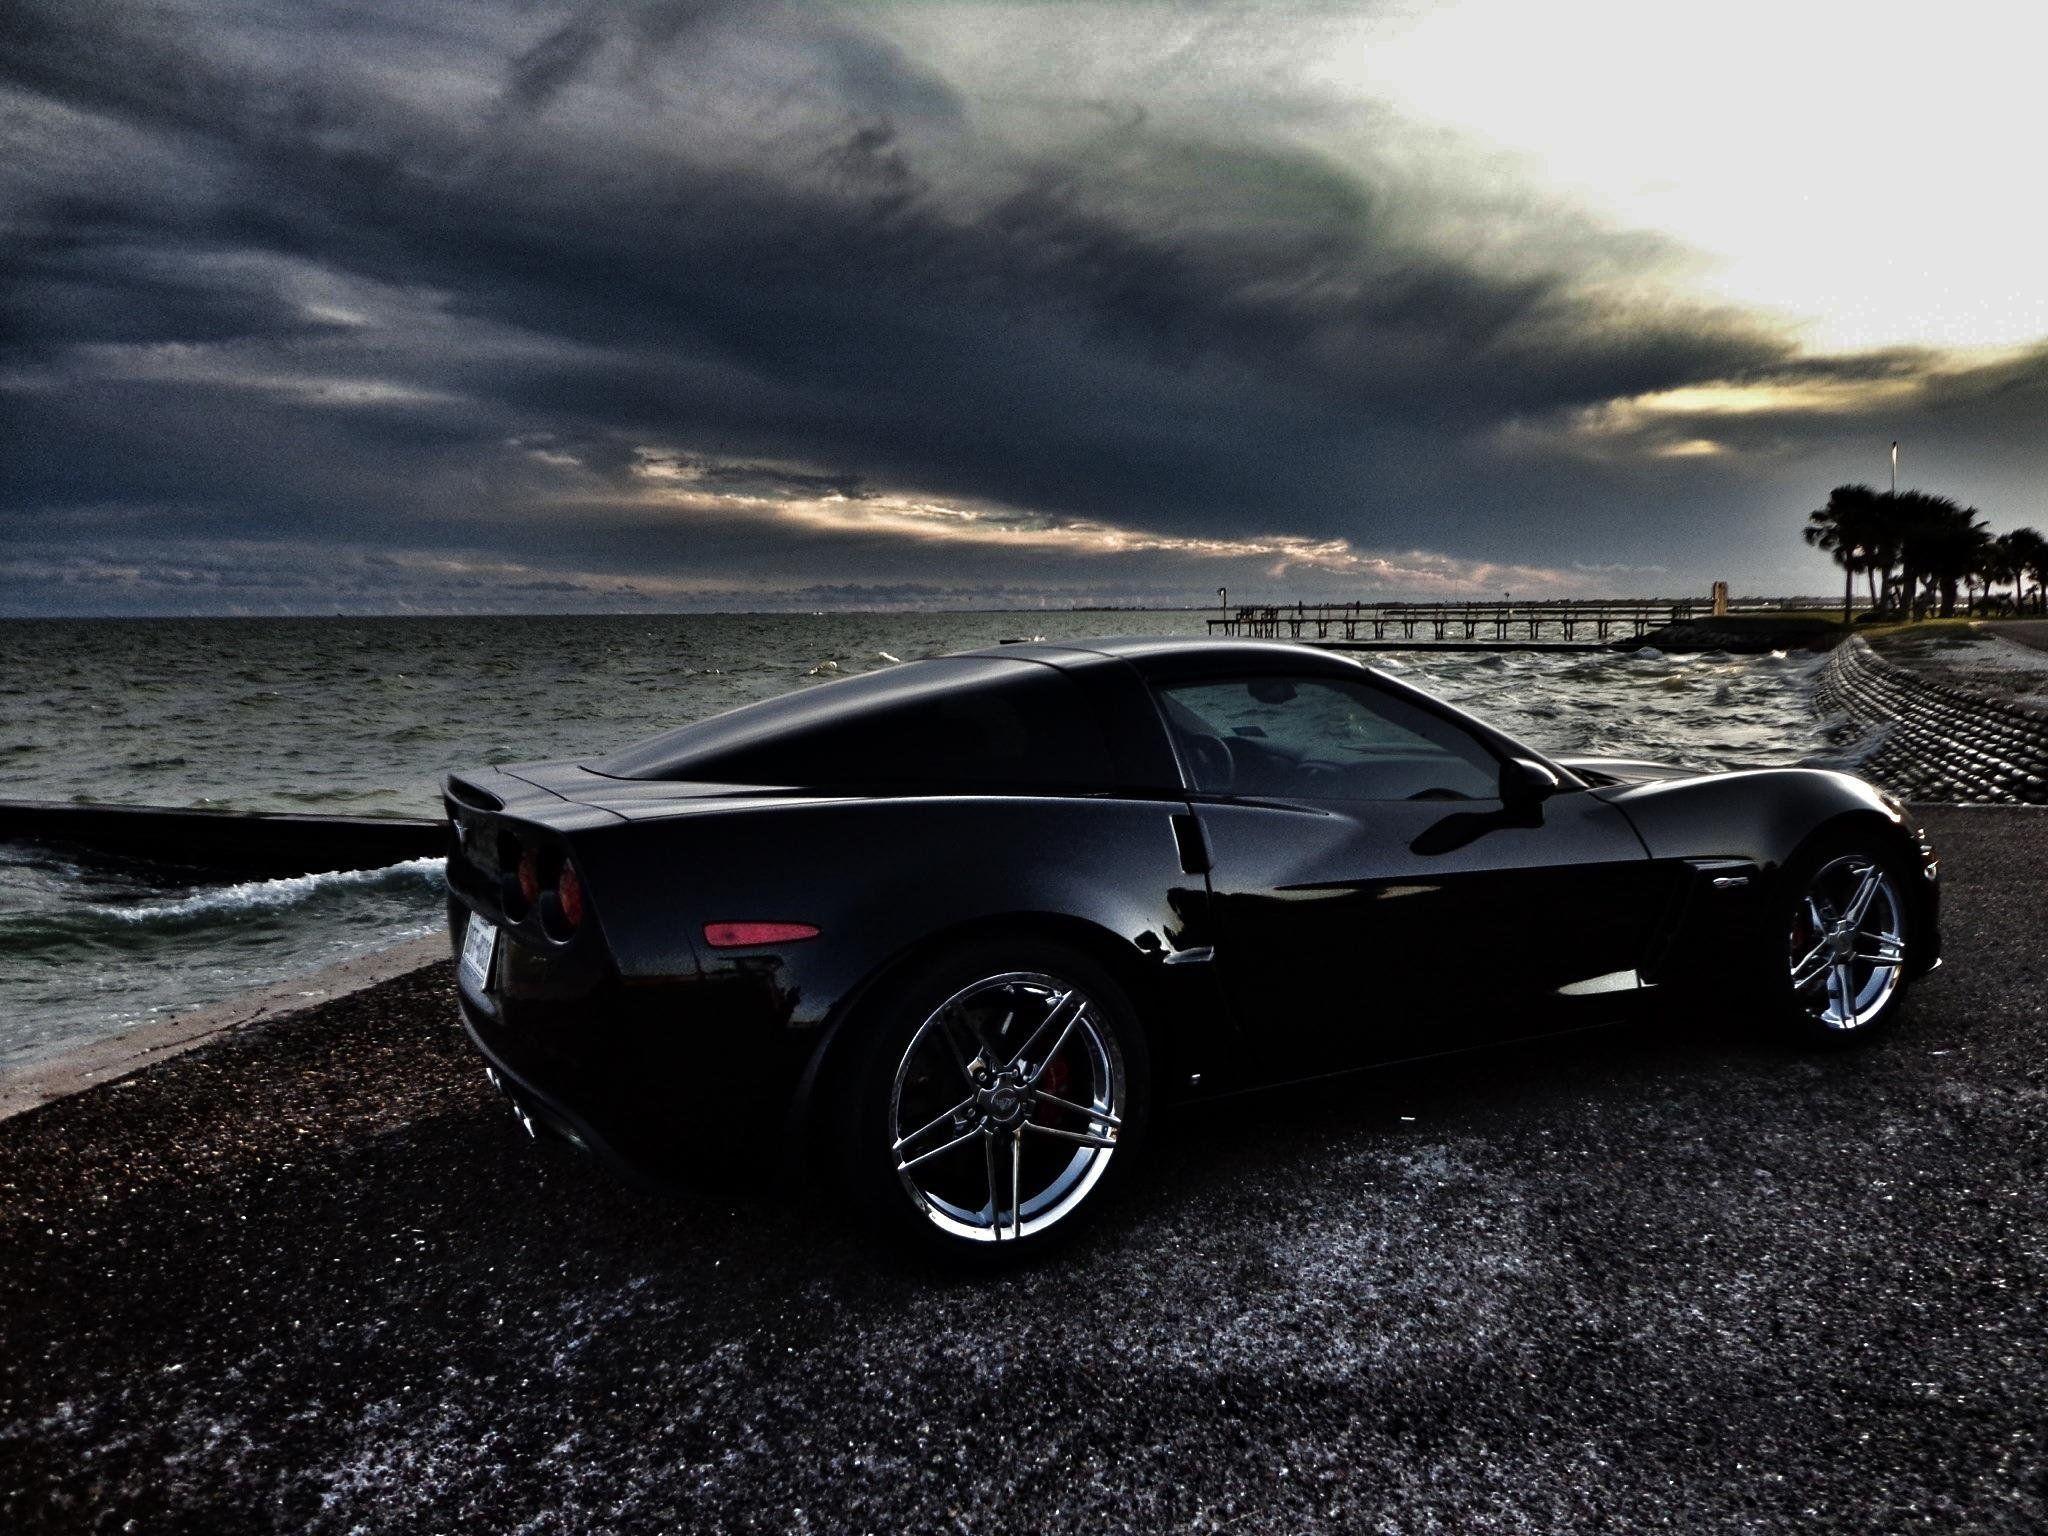 Corvette burnout wallpapers top free corvette burnout backgrounds wallpaperaccess - Corvette c6 wallpaper ...